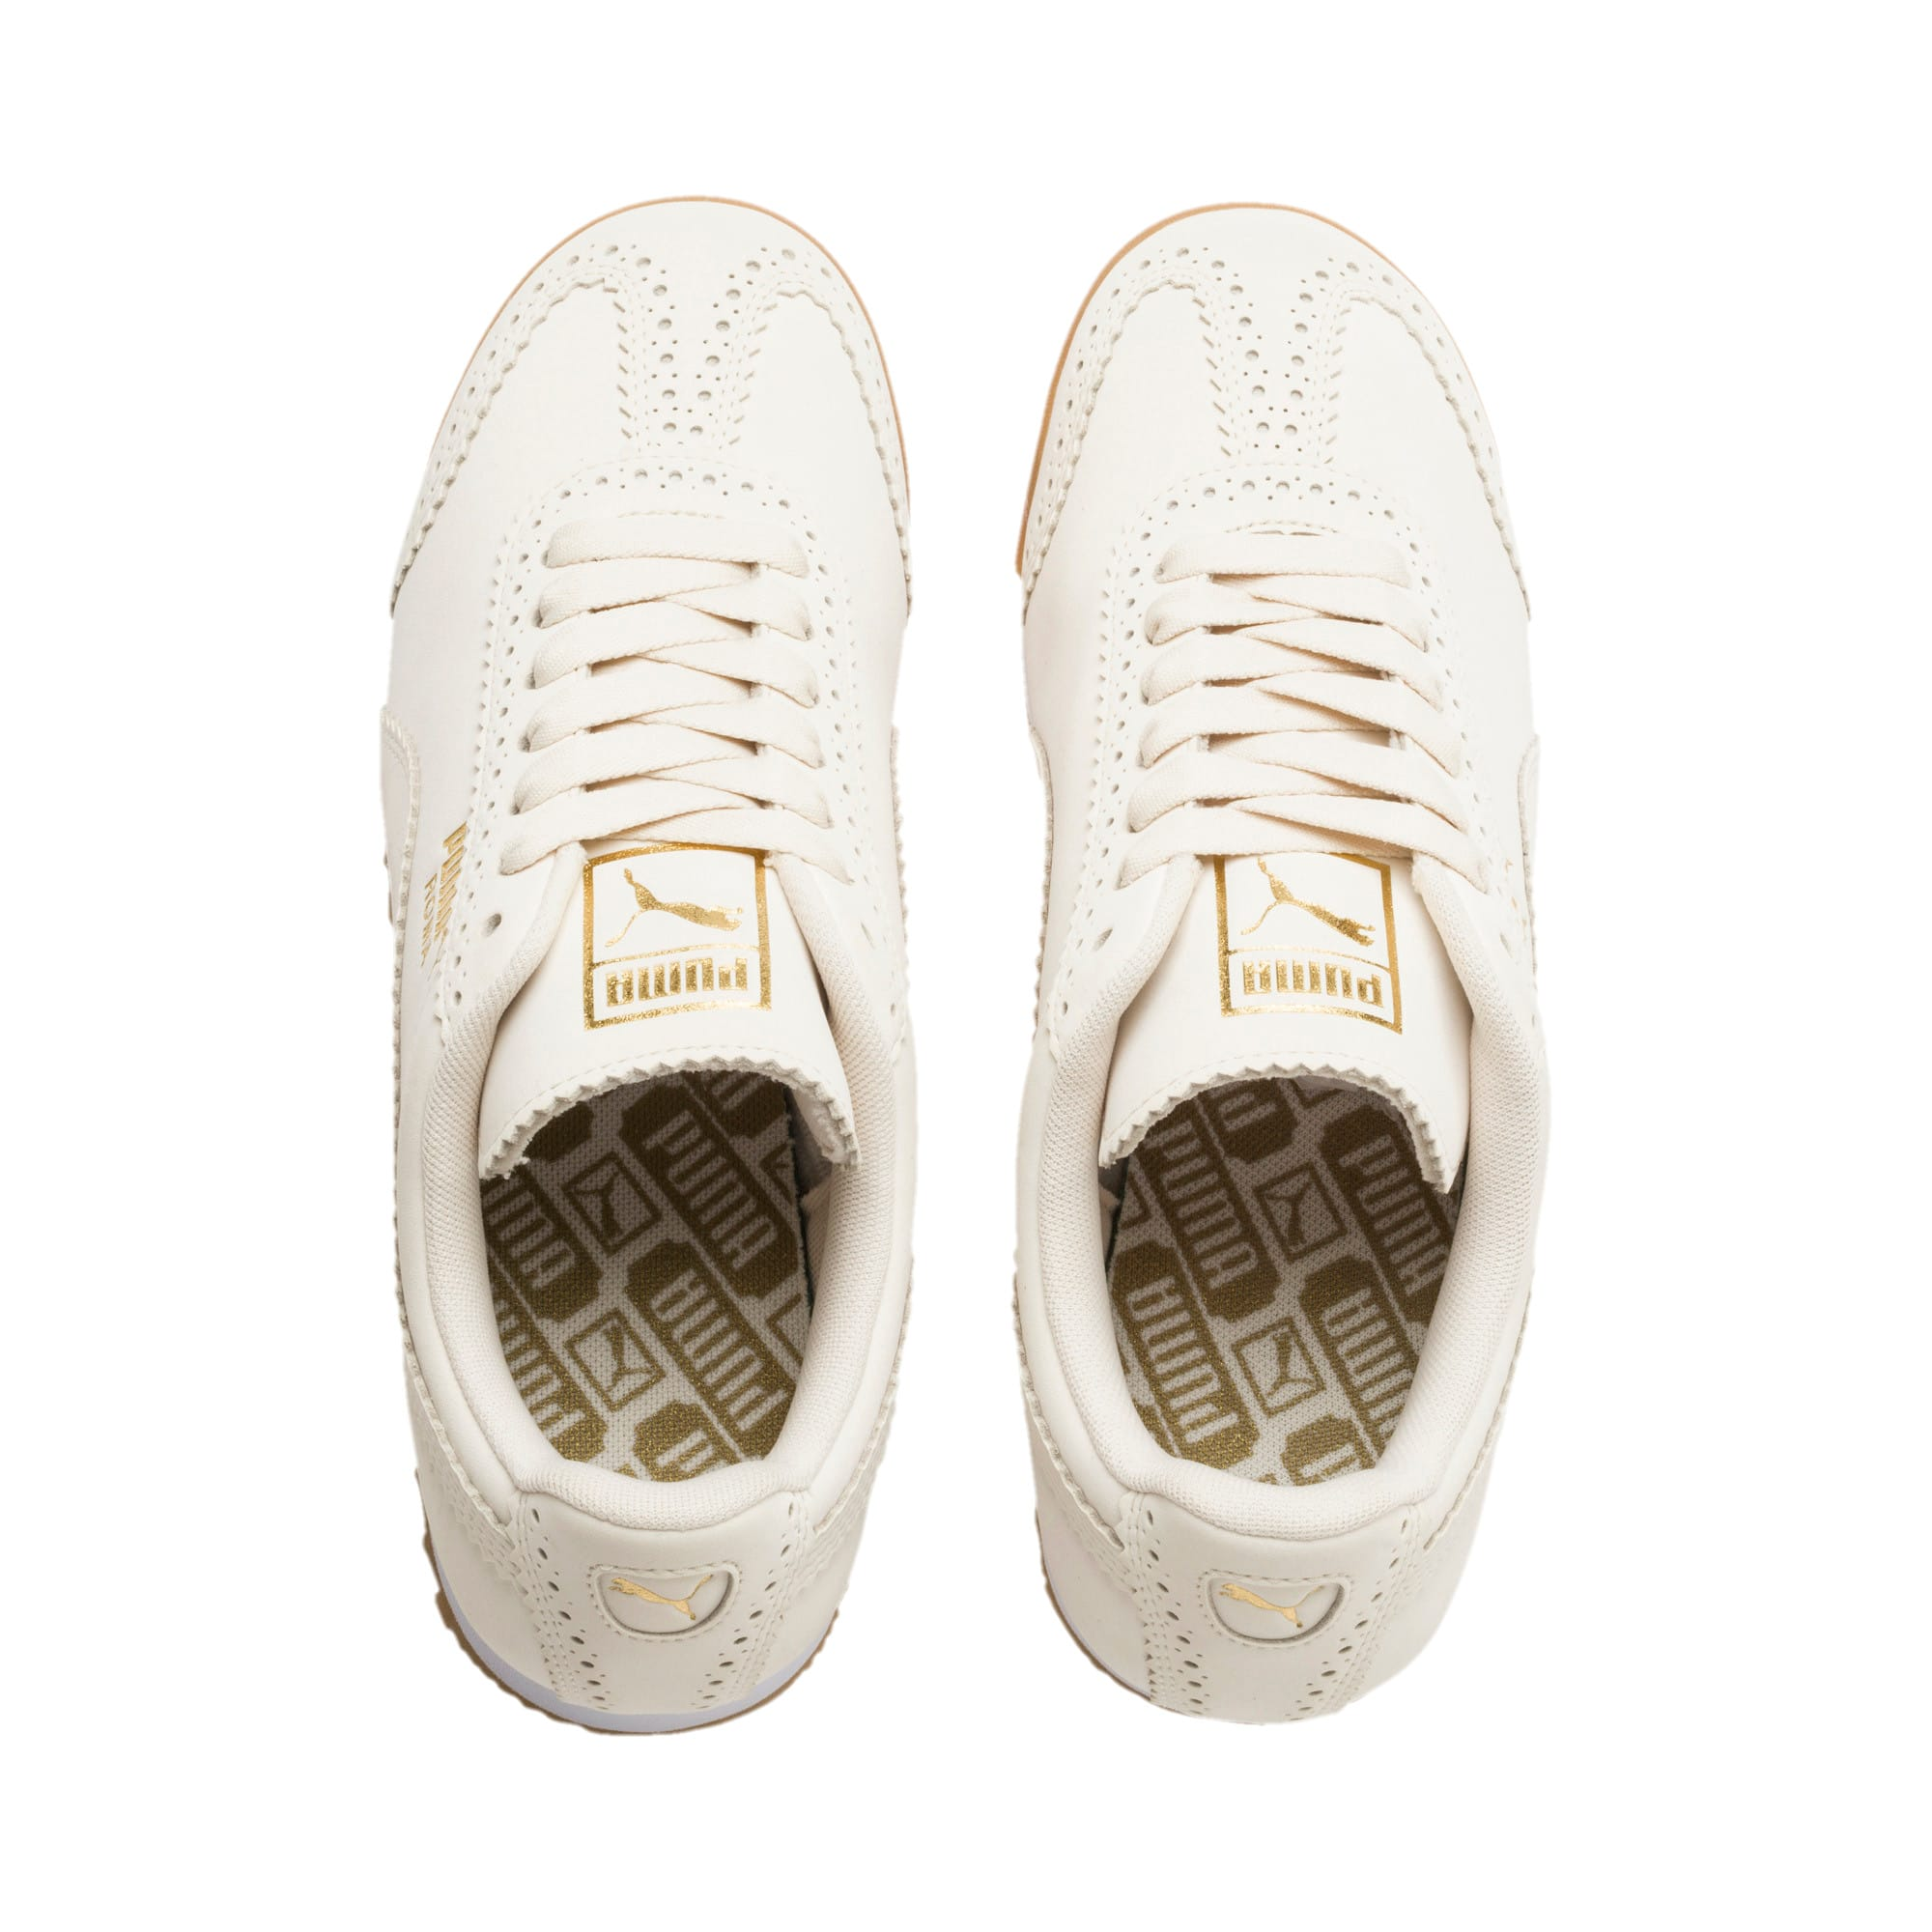 Thumbnail 7 of Roma Brogue Women's Sneakers, Pastel Parchment-P.Team Gold, medium